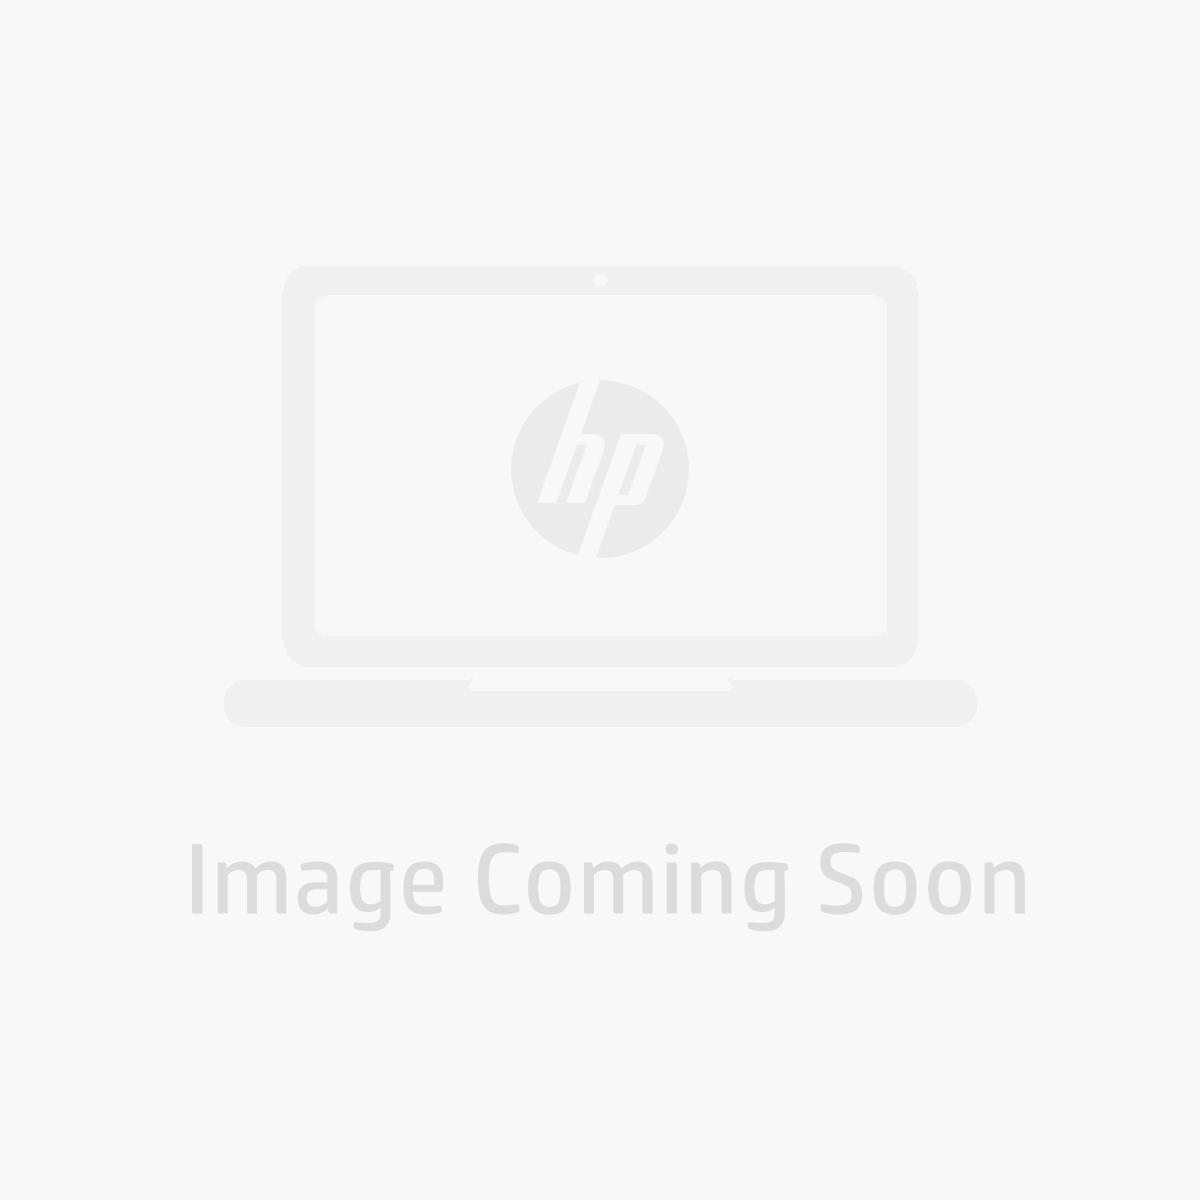 "HP V197 47 cm (18.5"") Monitor"